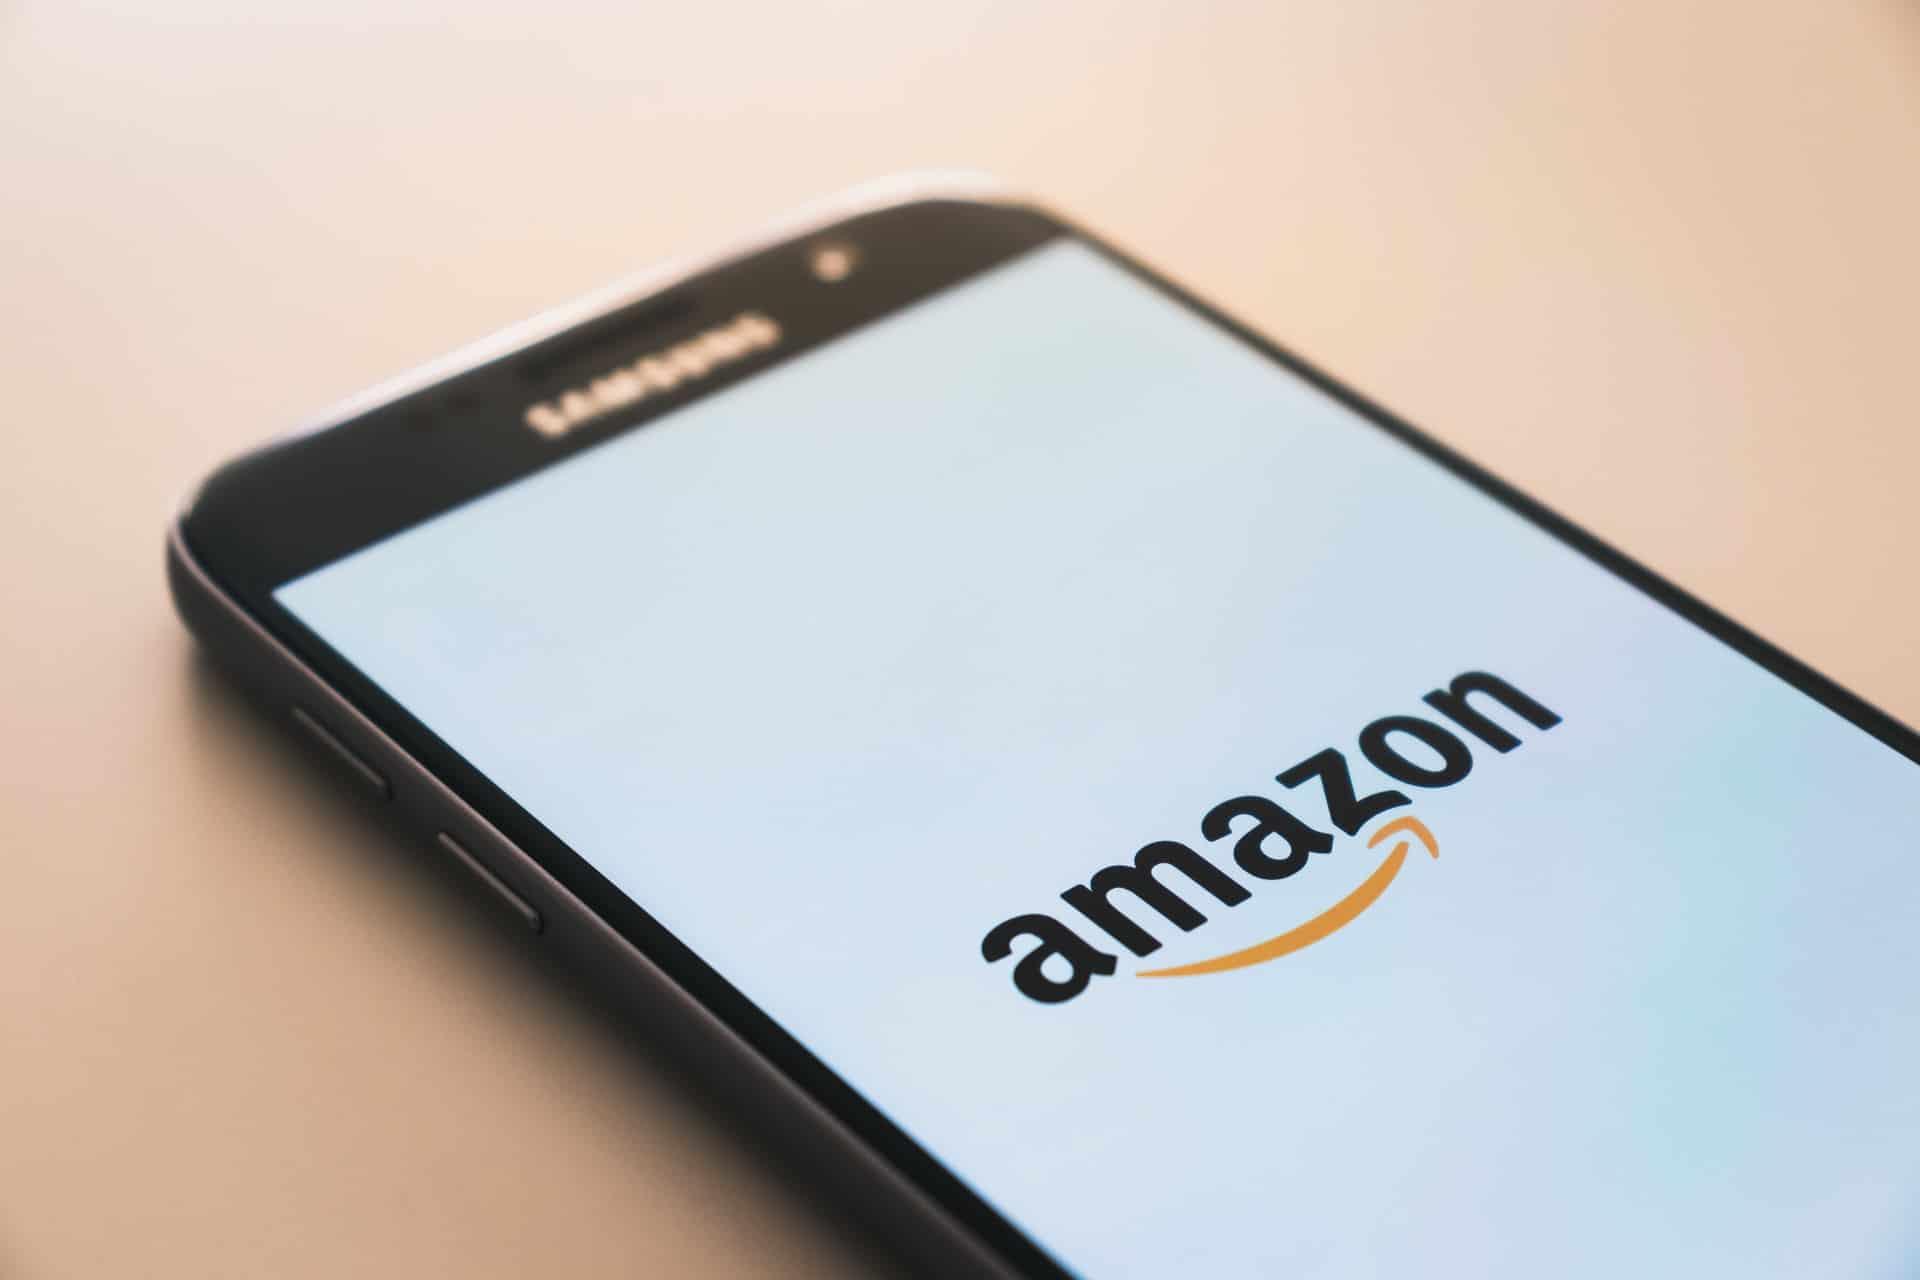 Amazon Statistics - Featured Image